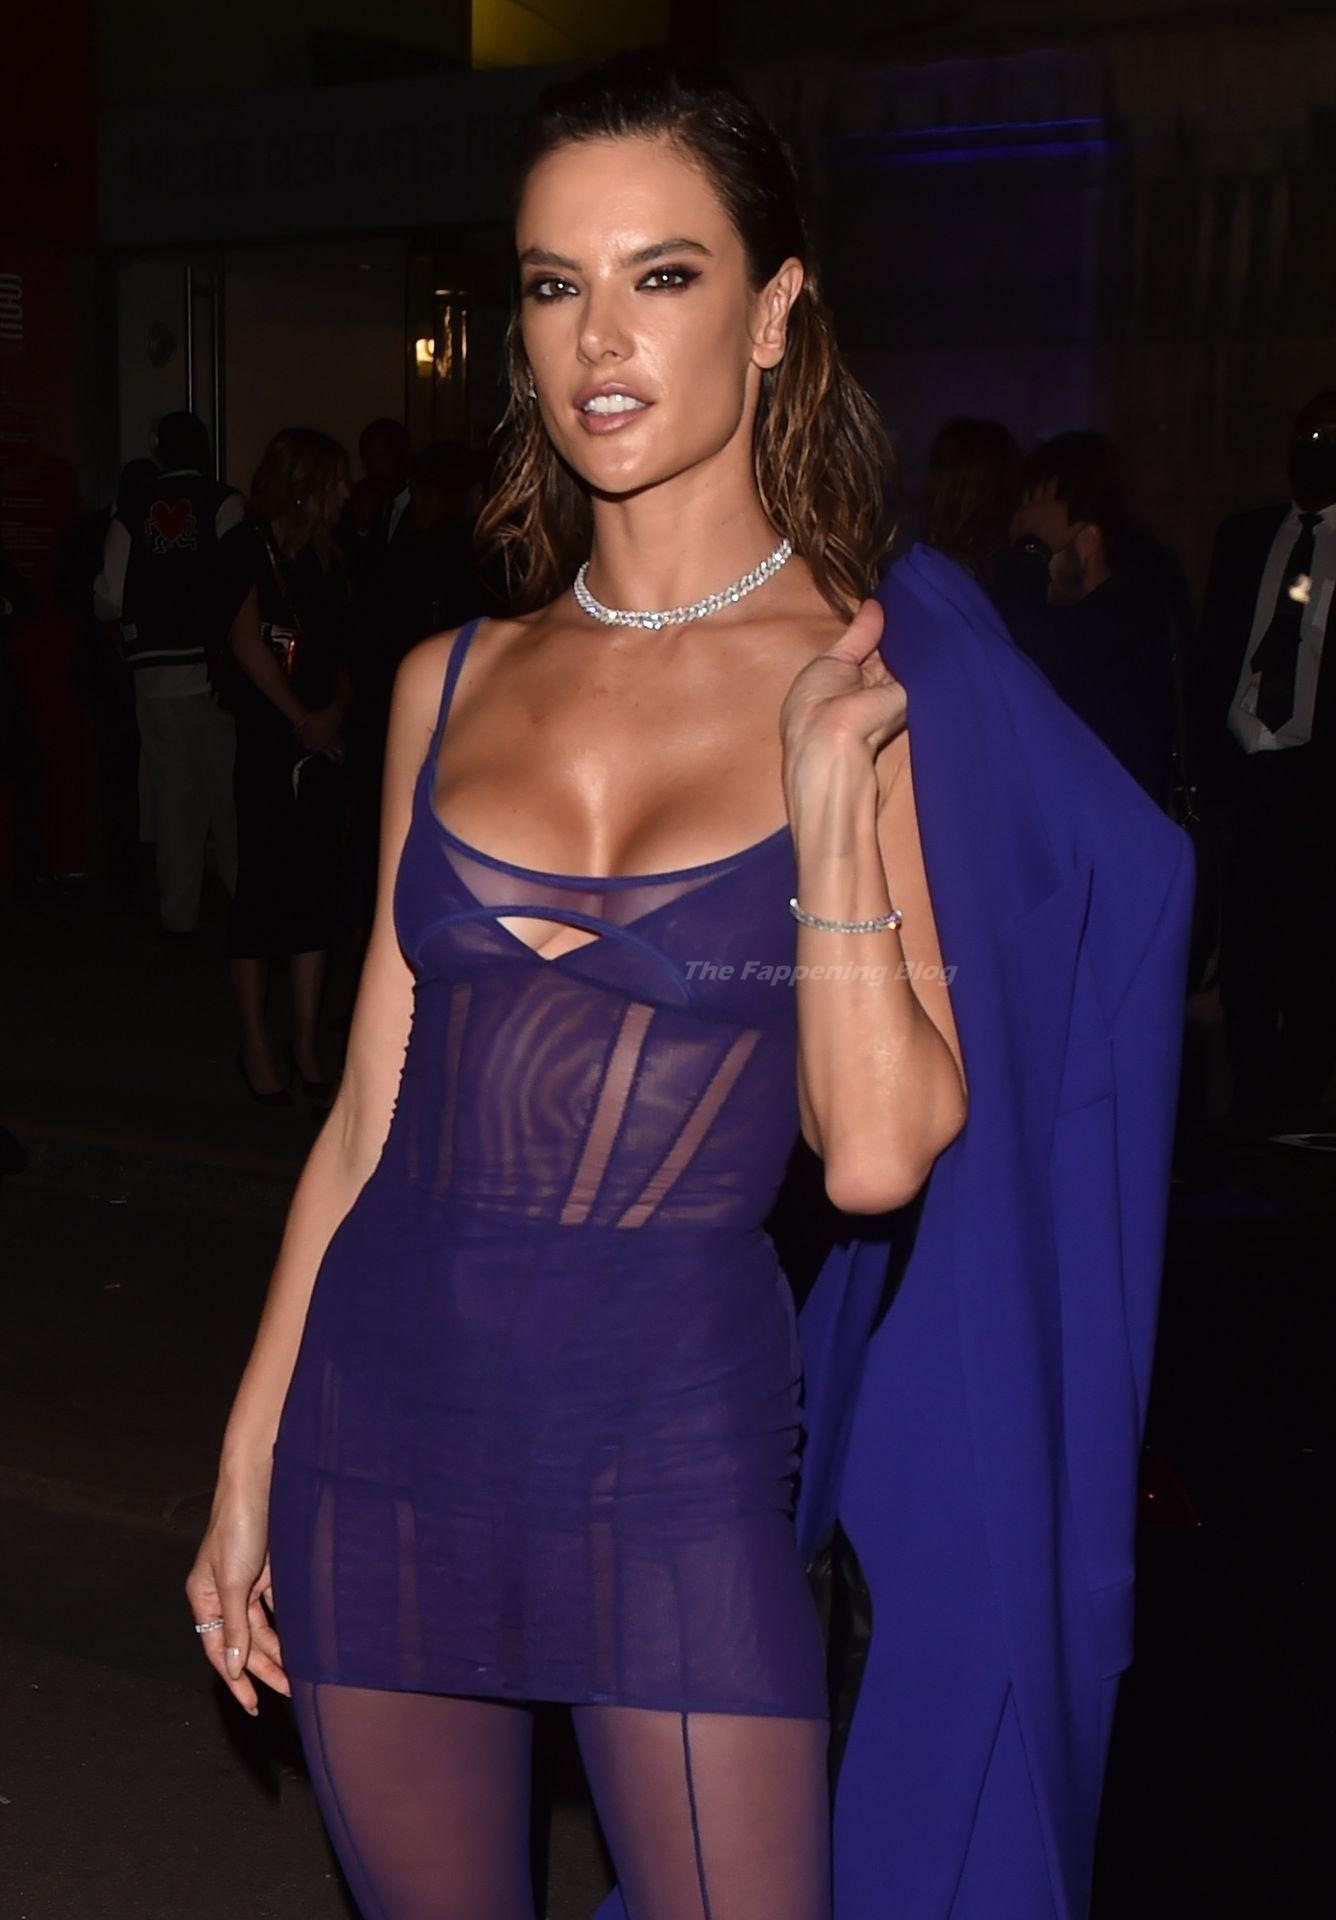 Alessandra-Ambrosio-Sexy-The-Fappening-Blog-82-1.jpg